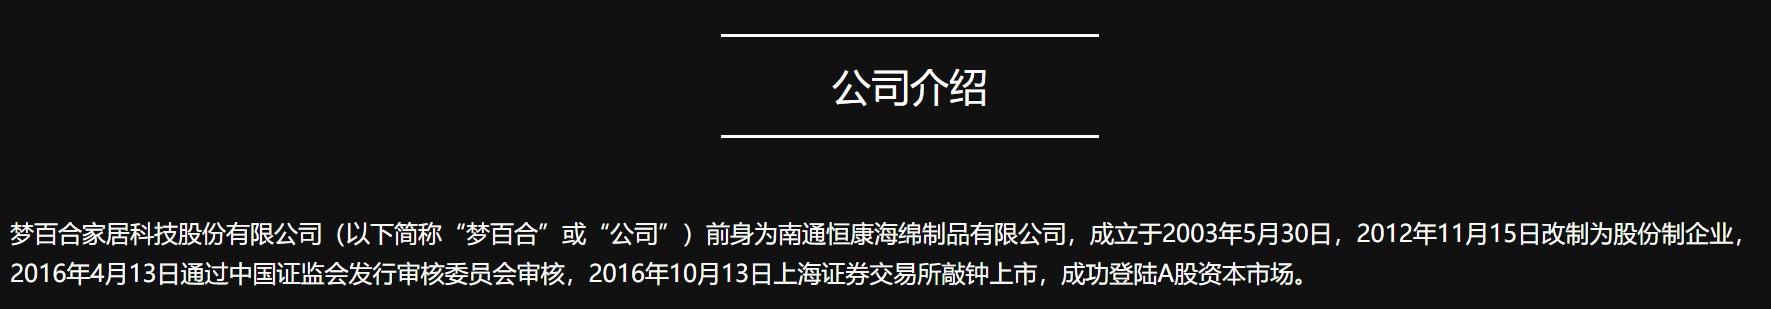 Mlilyの成り立ち(中国)